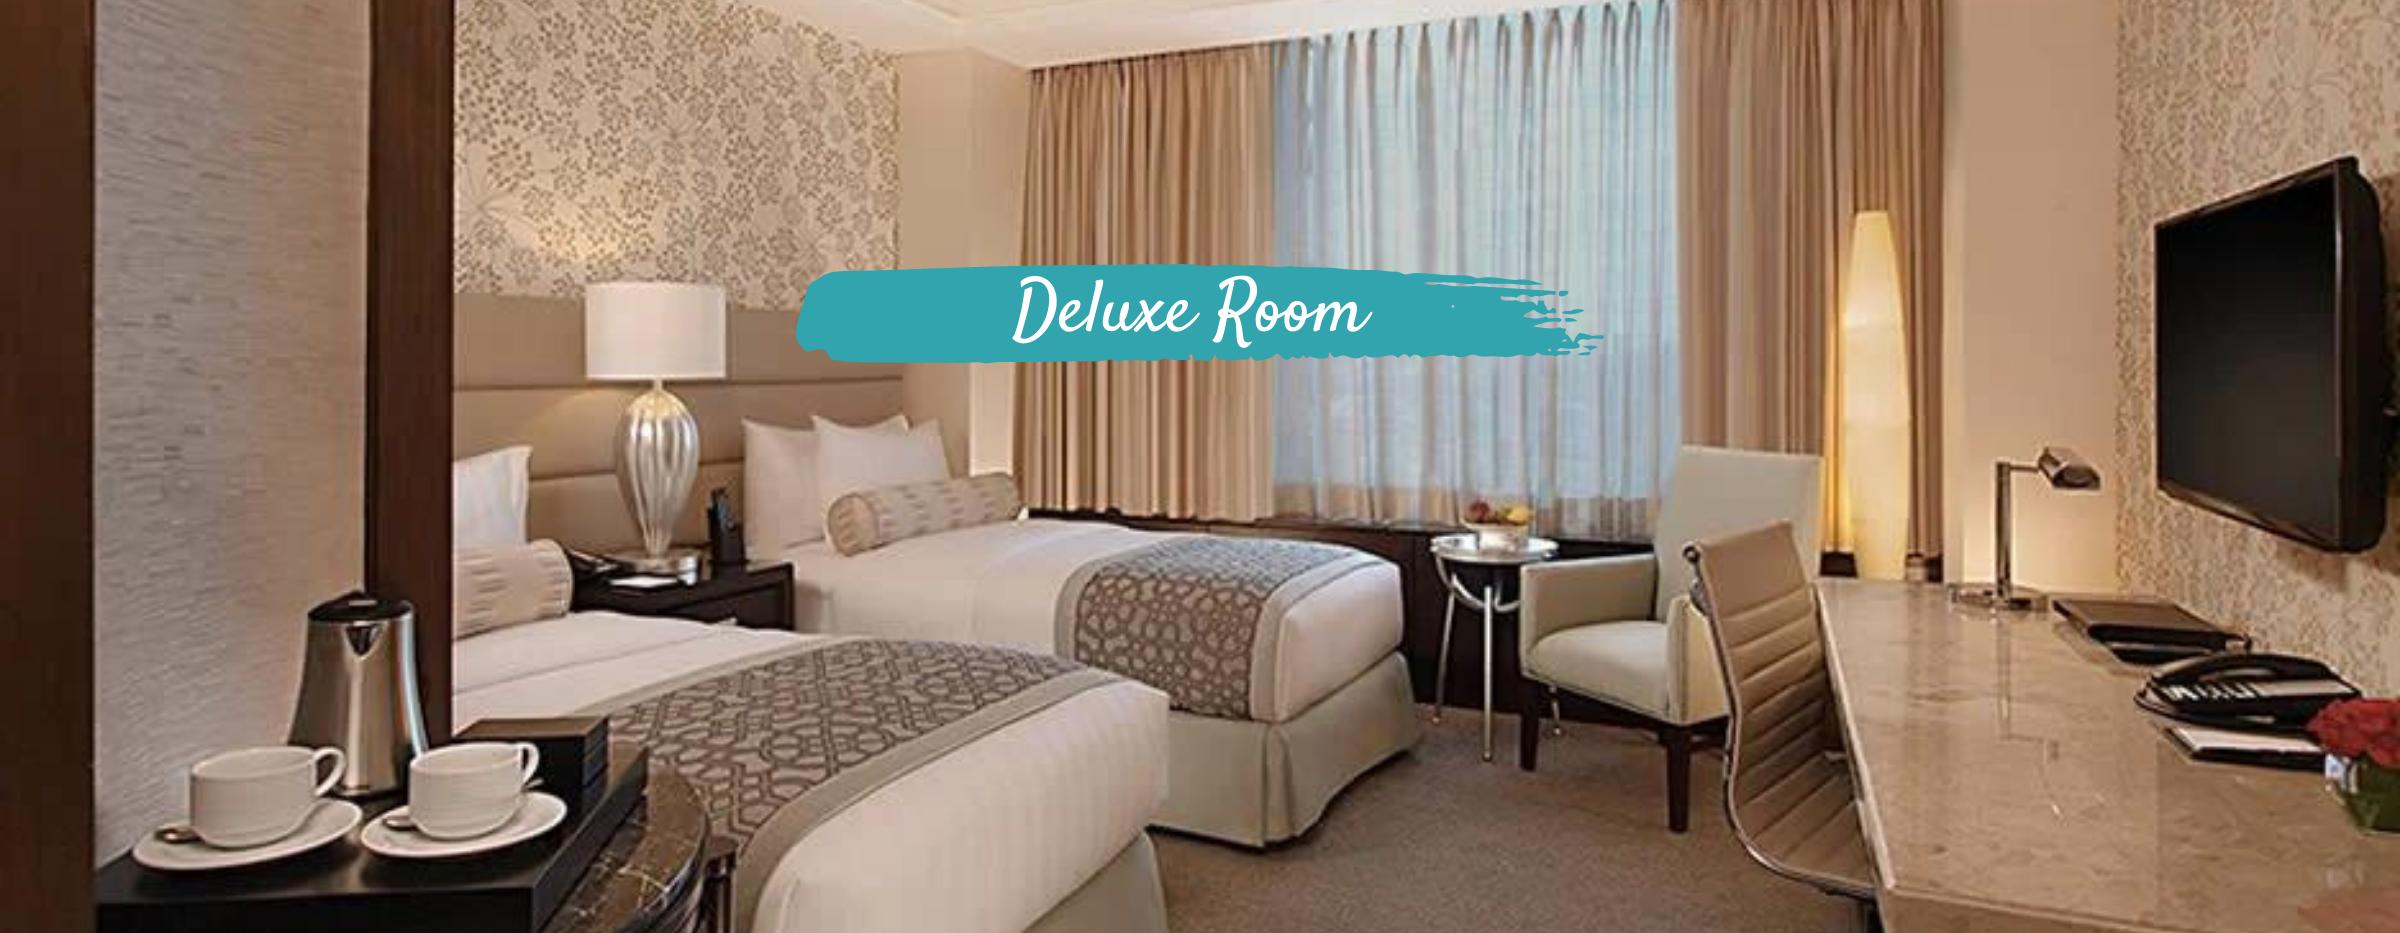 Crimson Alabang Deluxe Room   SFO to MNL Philippine Airlines Flight + Manila Hotel Quarantine Package